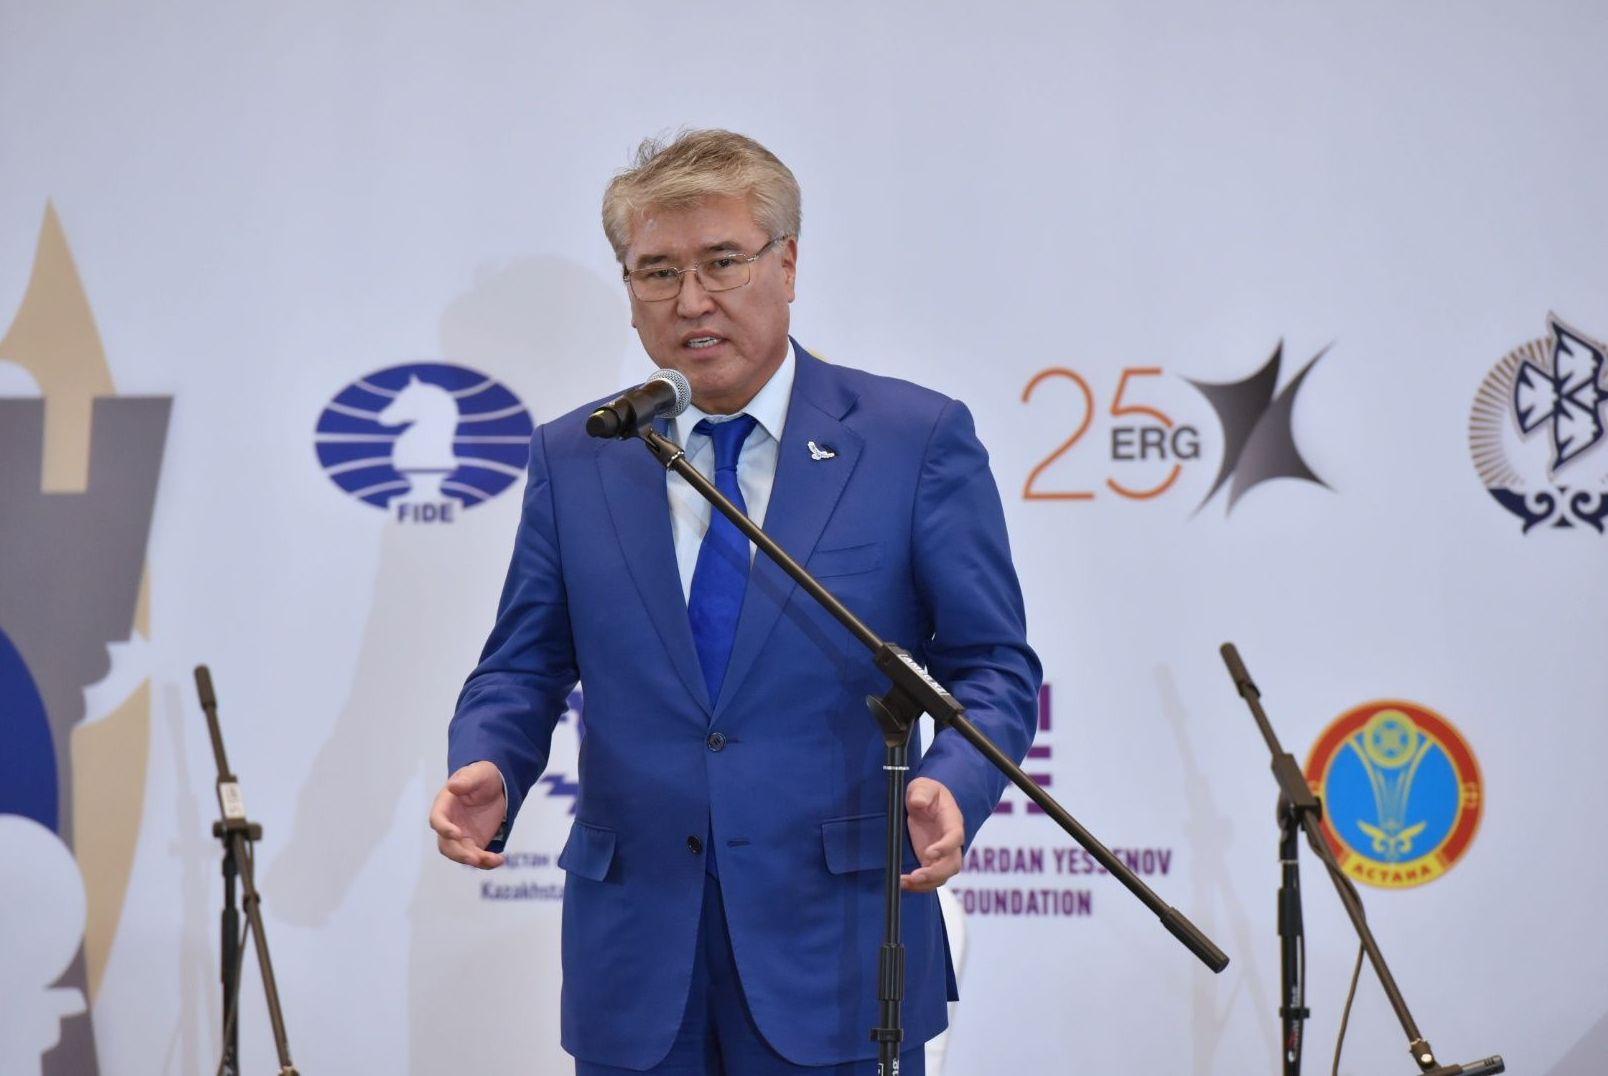 Арыстанбек Мухамедиулы на открытии Чемпионата мира по шахматам среди женщин в Астане